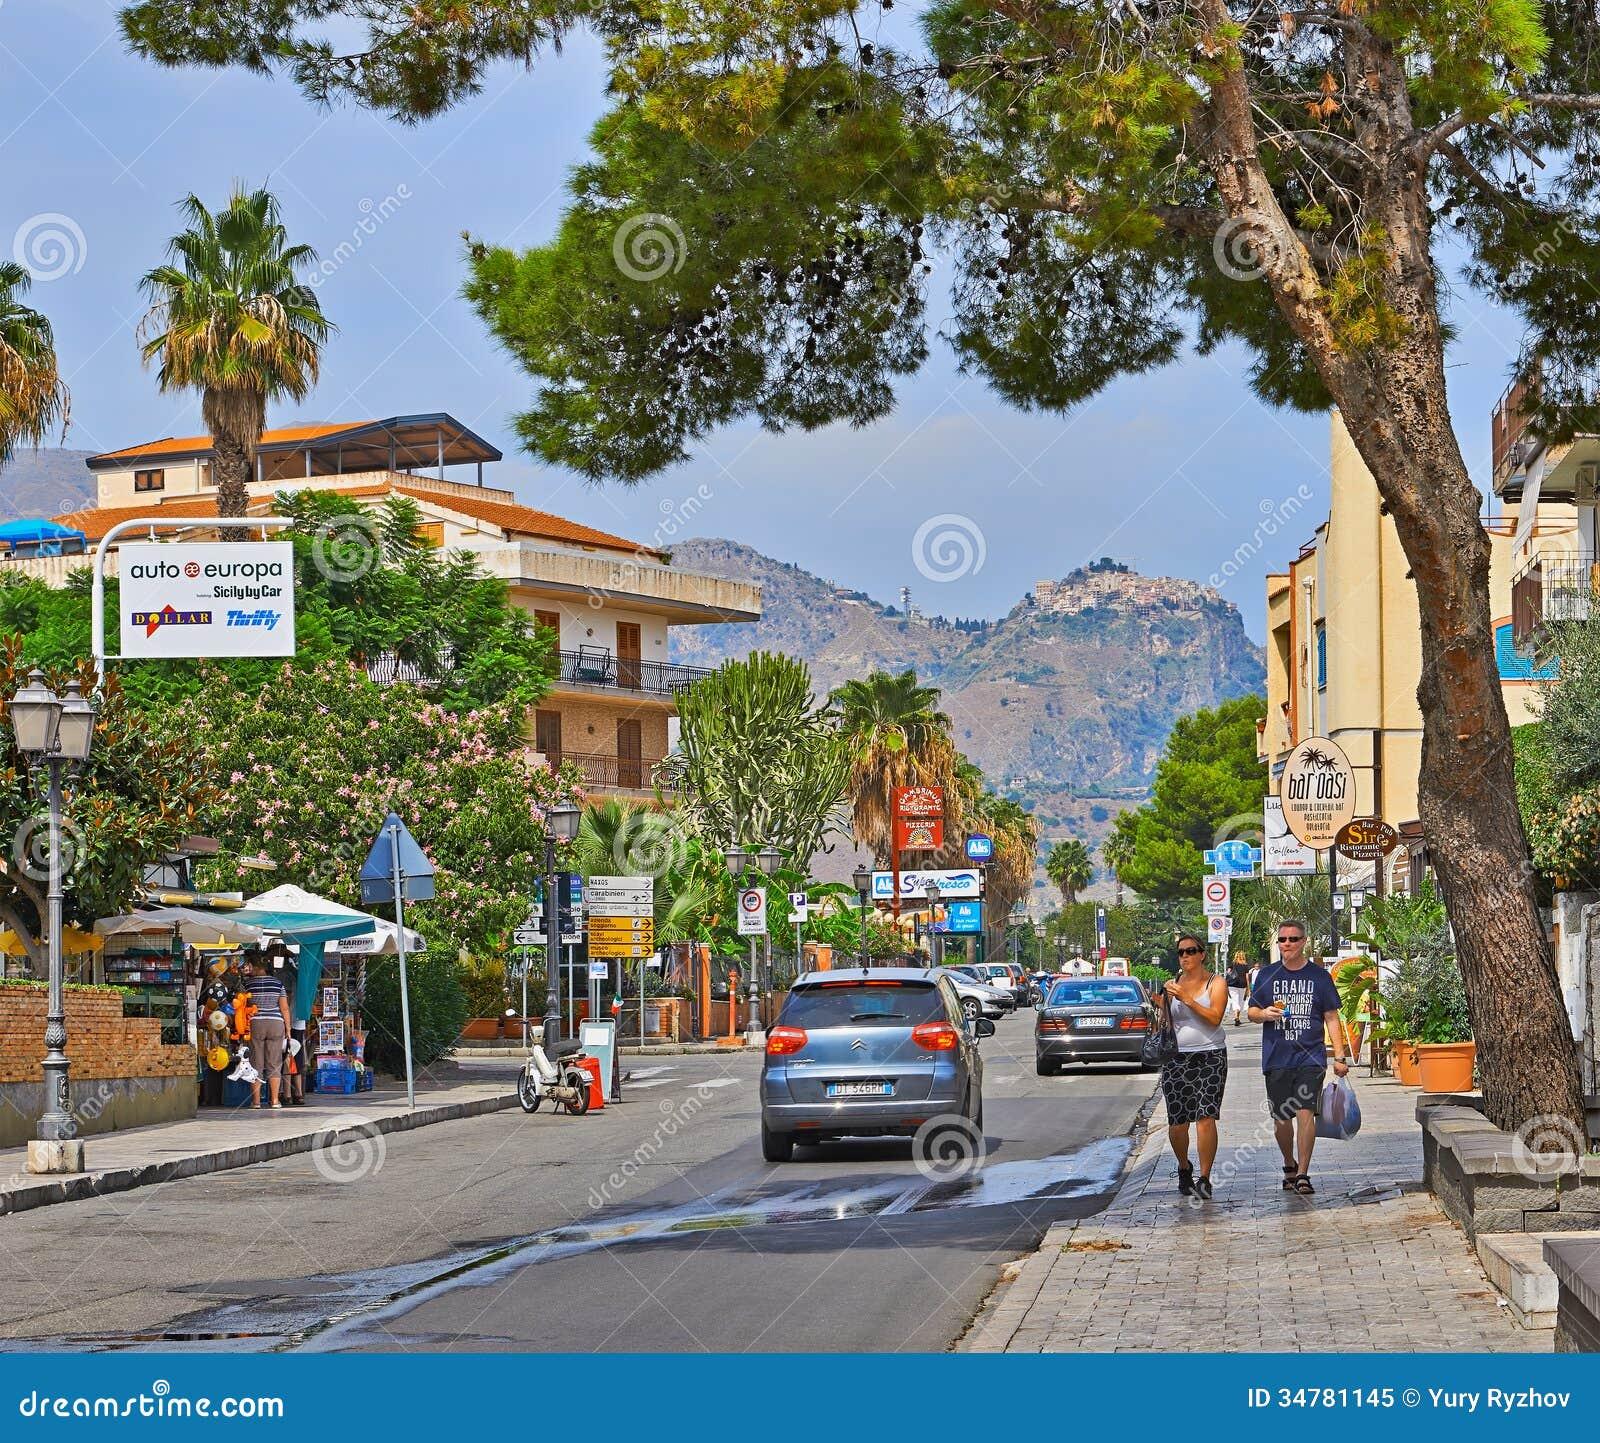 Via recanati editorial image image of summer people for Mobilia giardini naxos